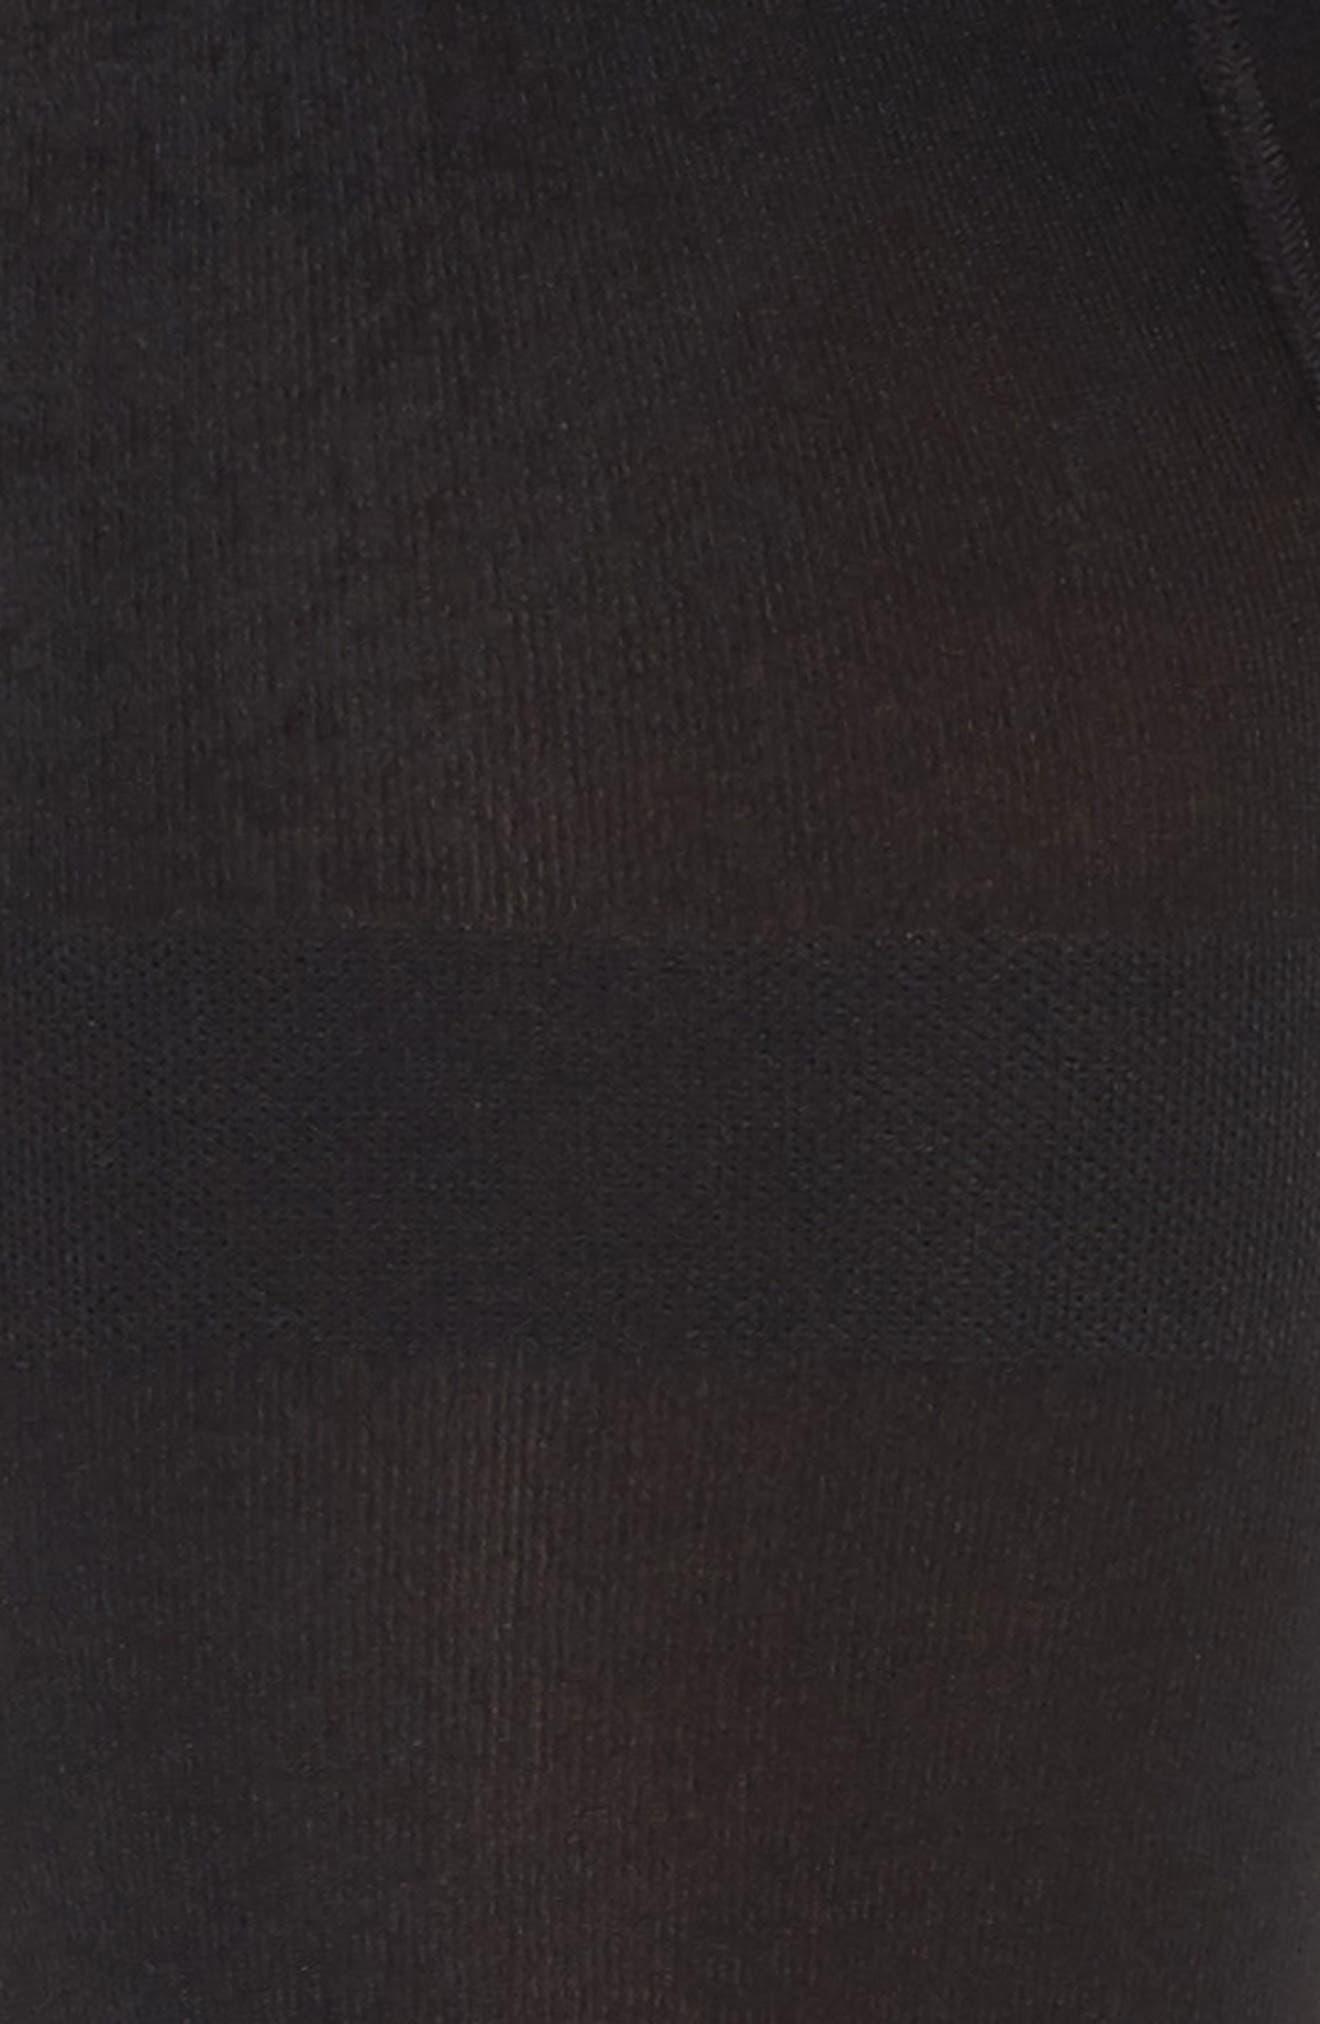 Alternate Image 2  - Nordstrom Fleece Lined Tights